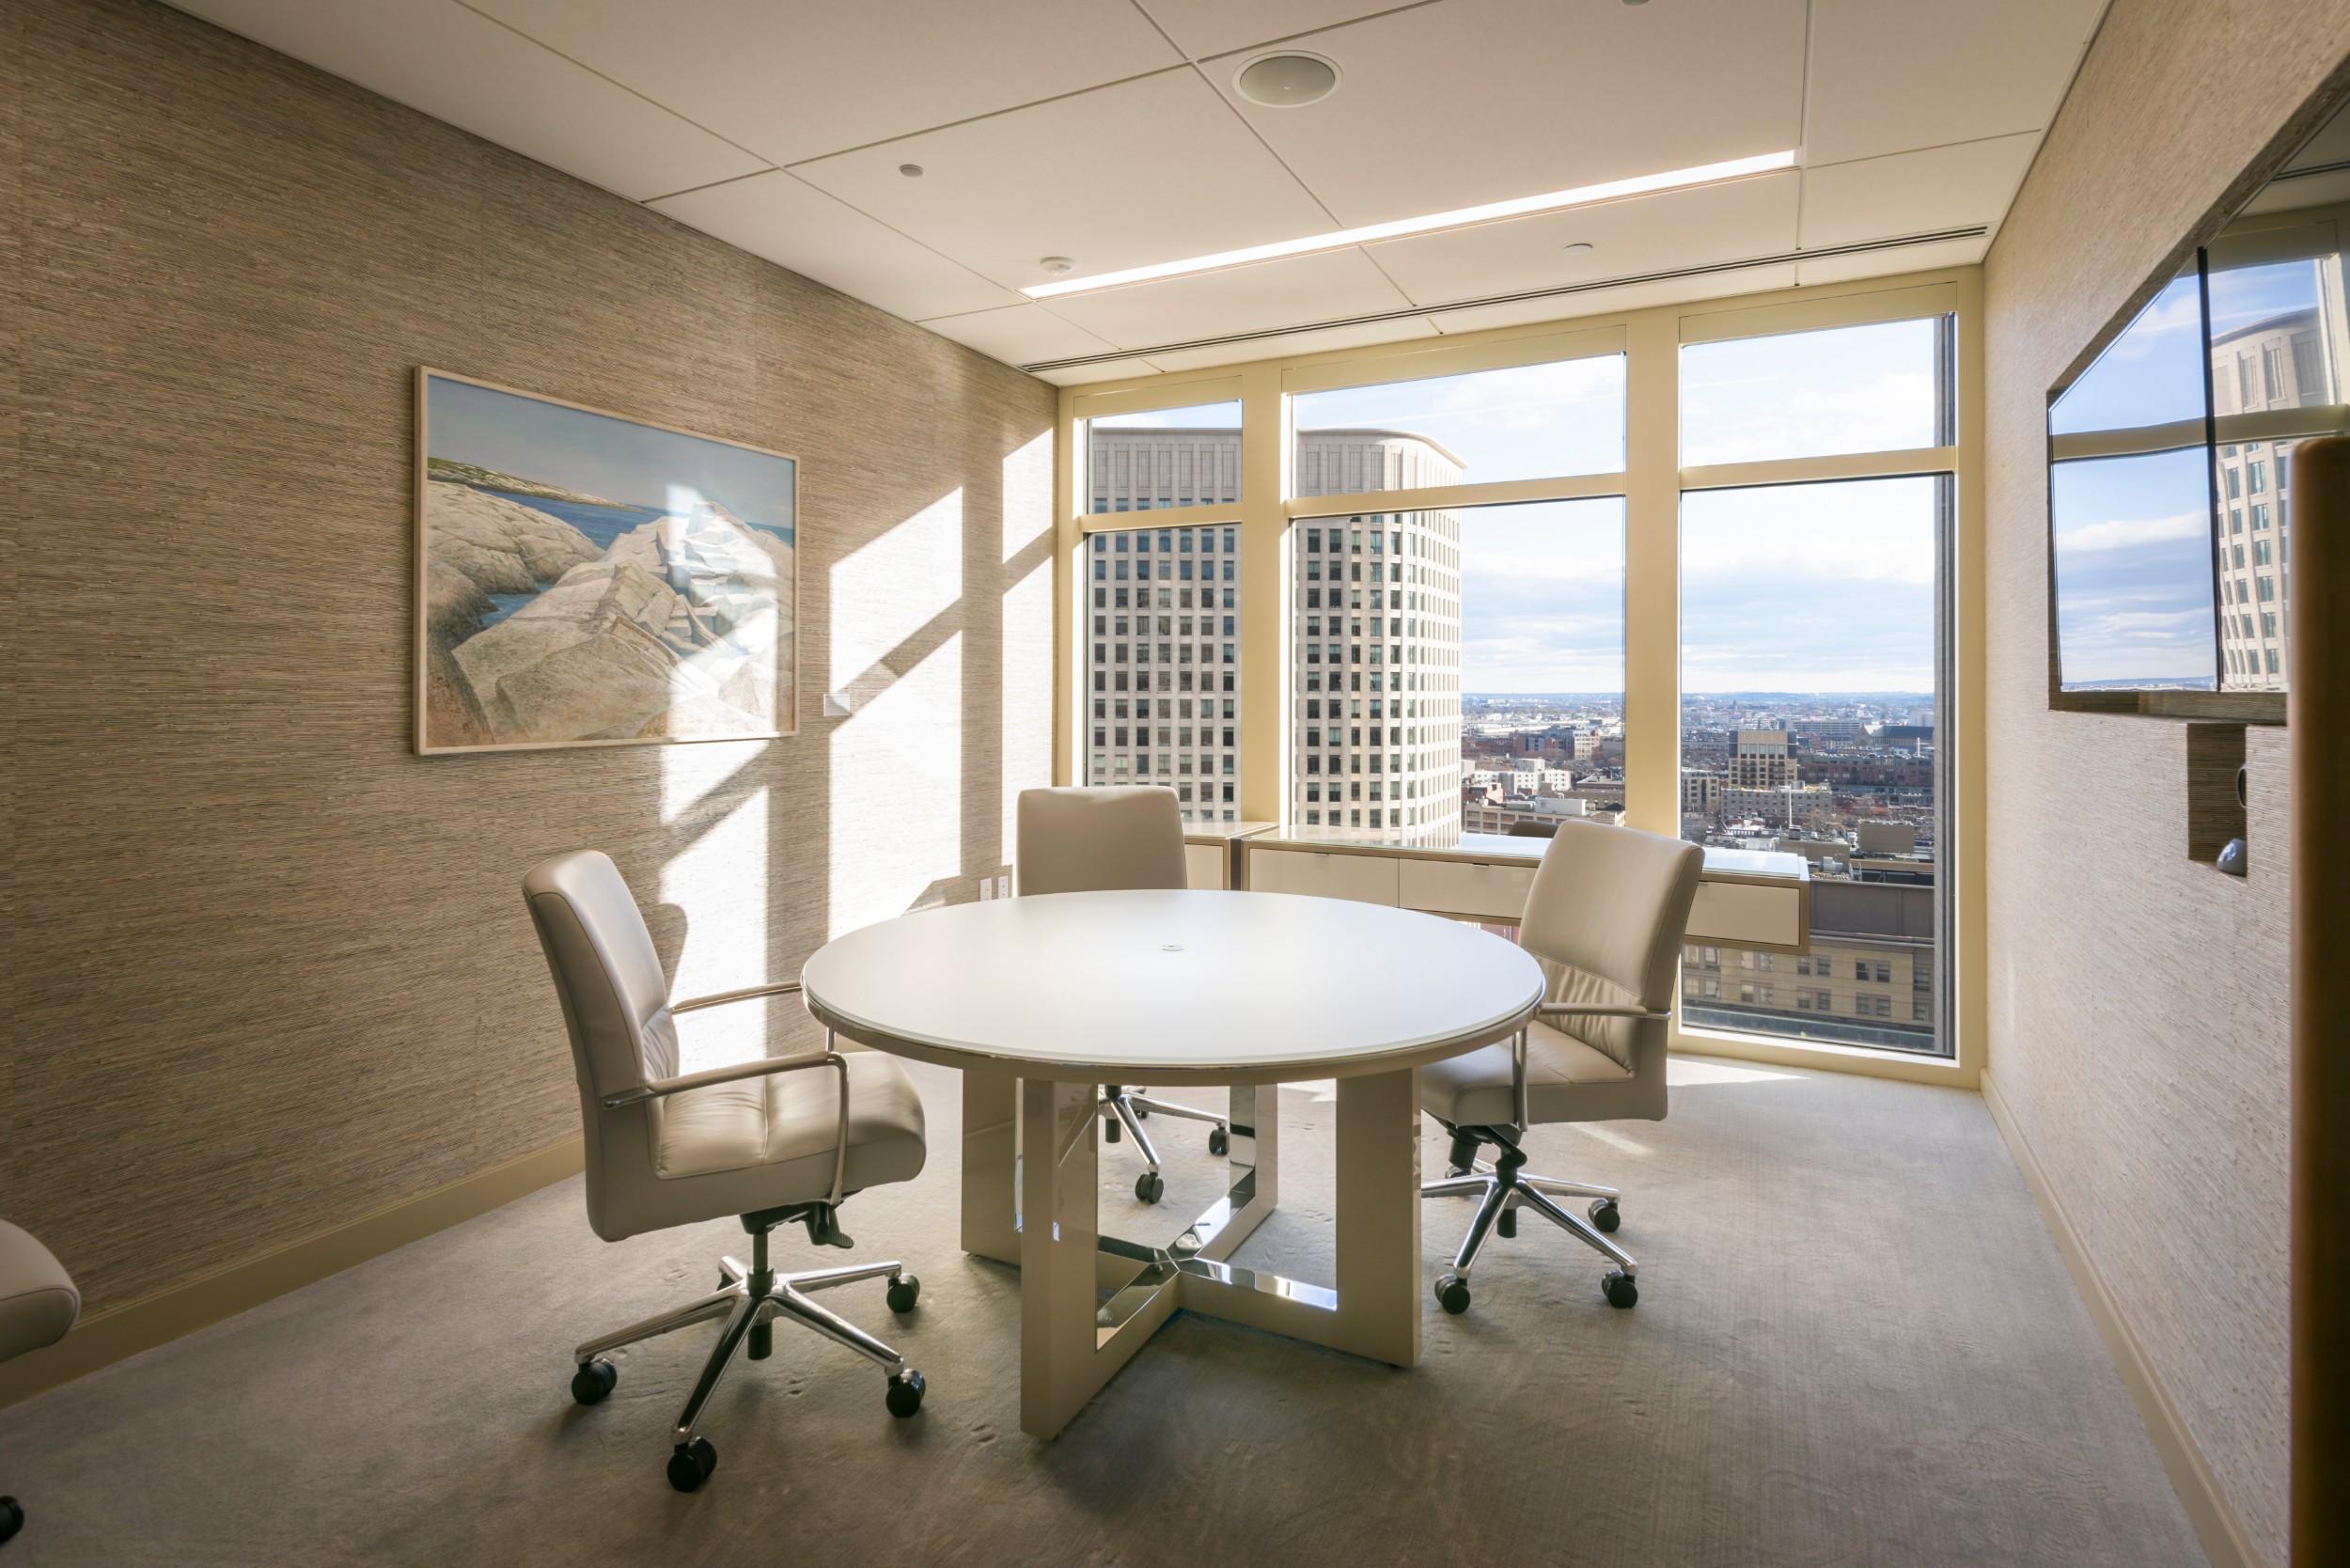 Corderman_Construction_Martignetti_Companies_Interior_Office_Buildout_Meeting_Room.jpg